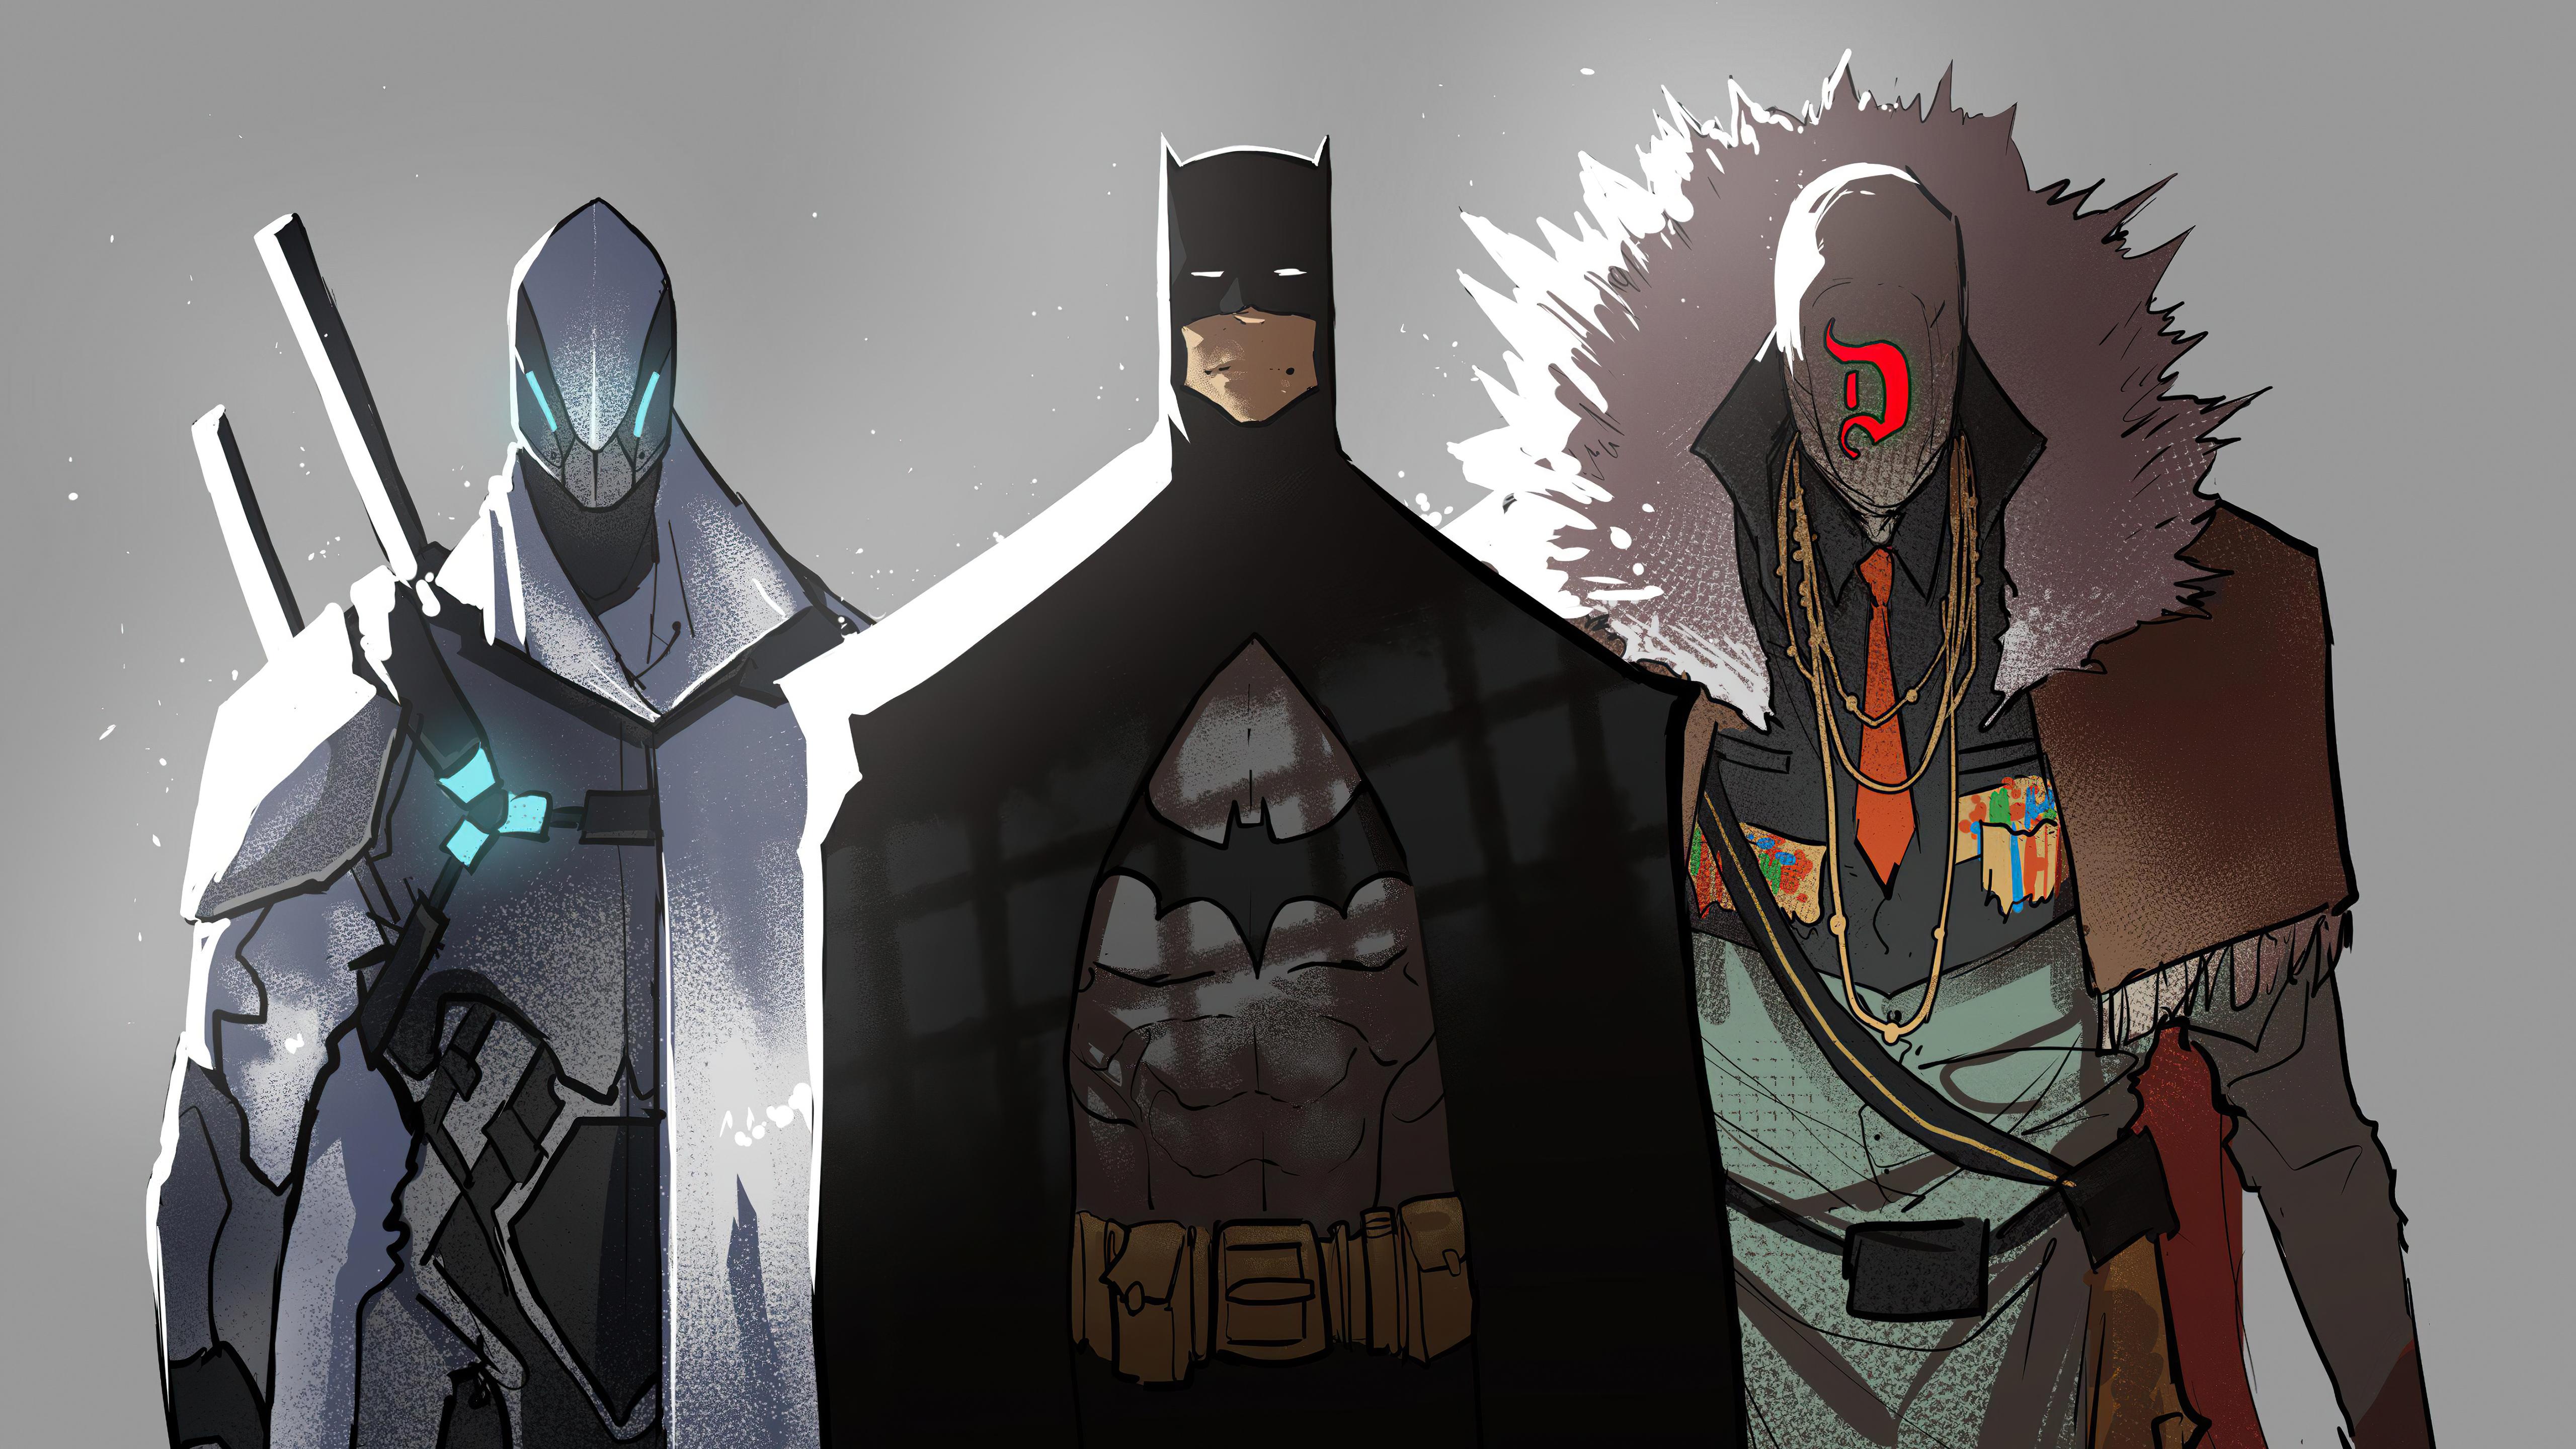 ghost maker batman 4k 1616955881 - Ghost Maker Batman 4k - Ghost Maker Batman 4k wallpapers